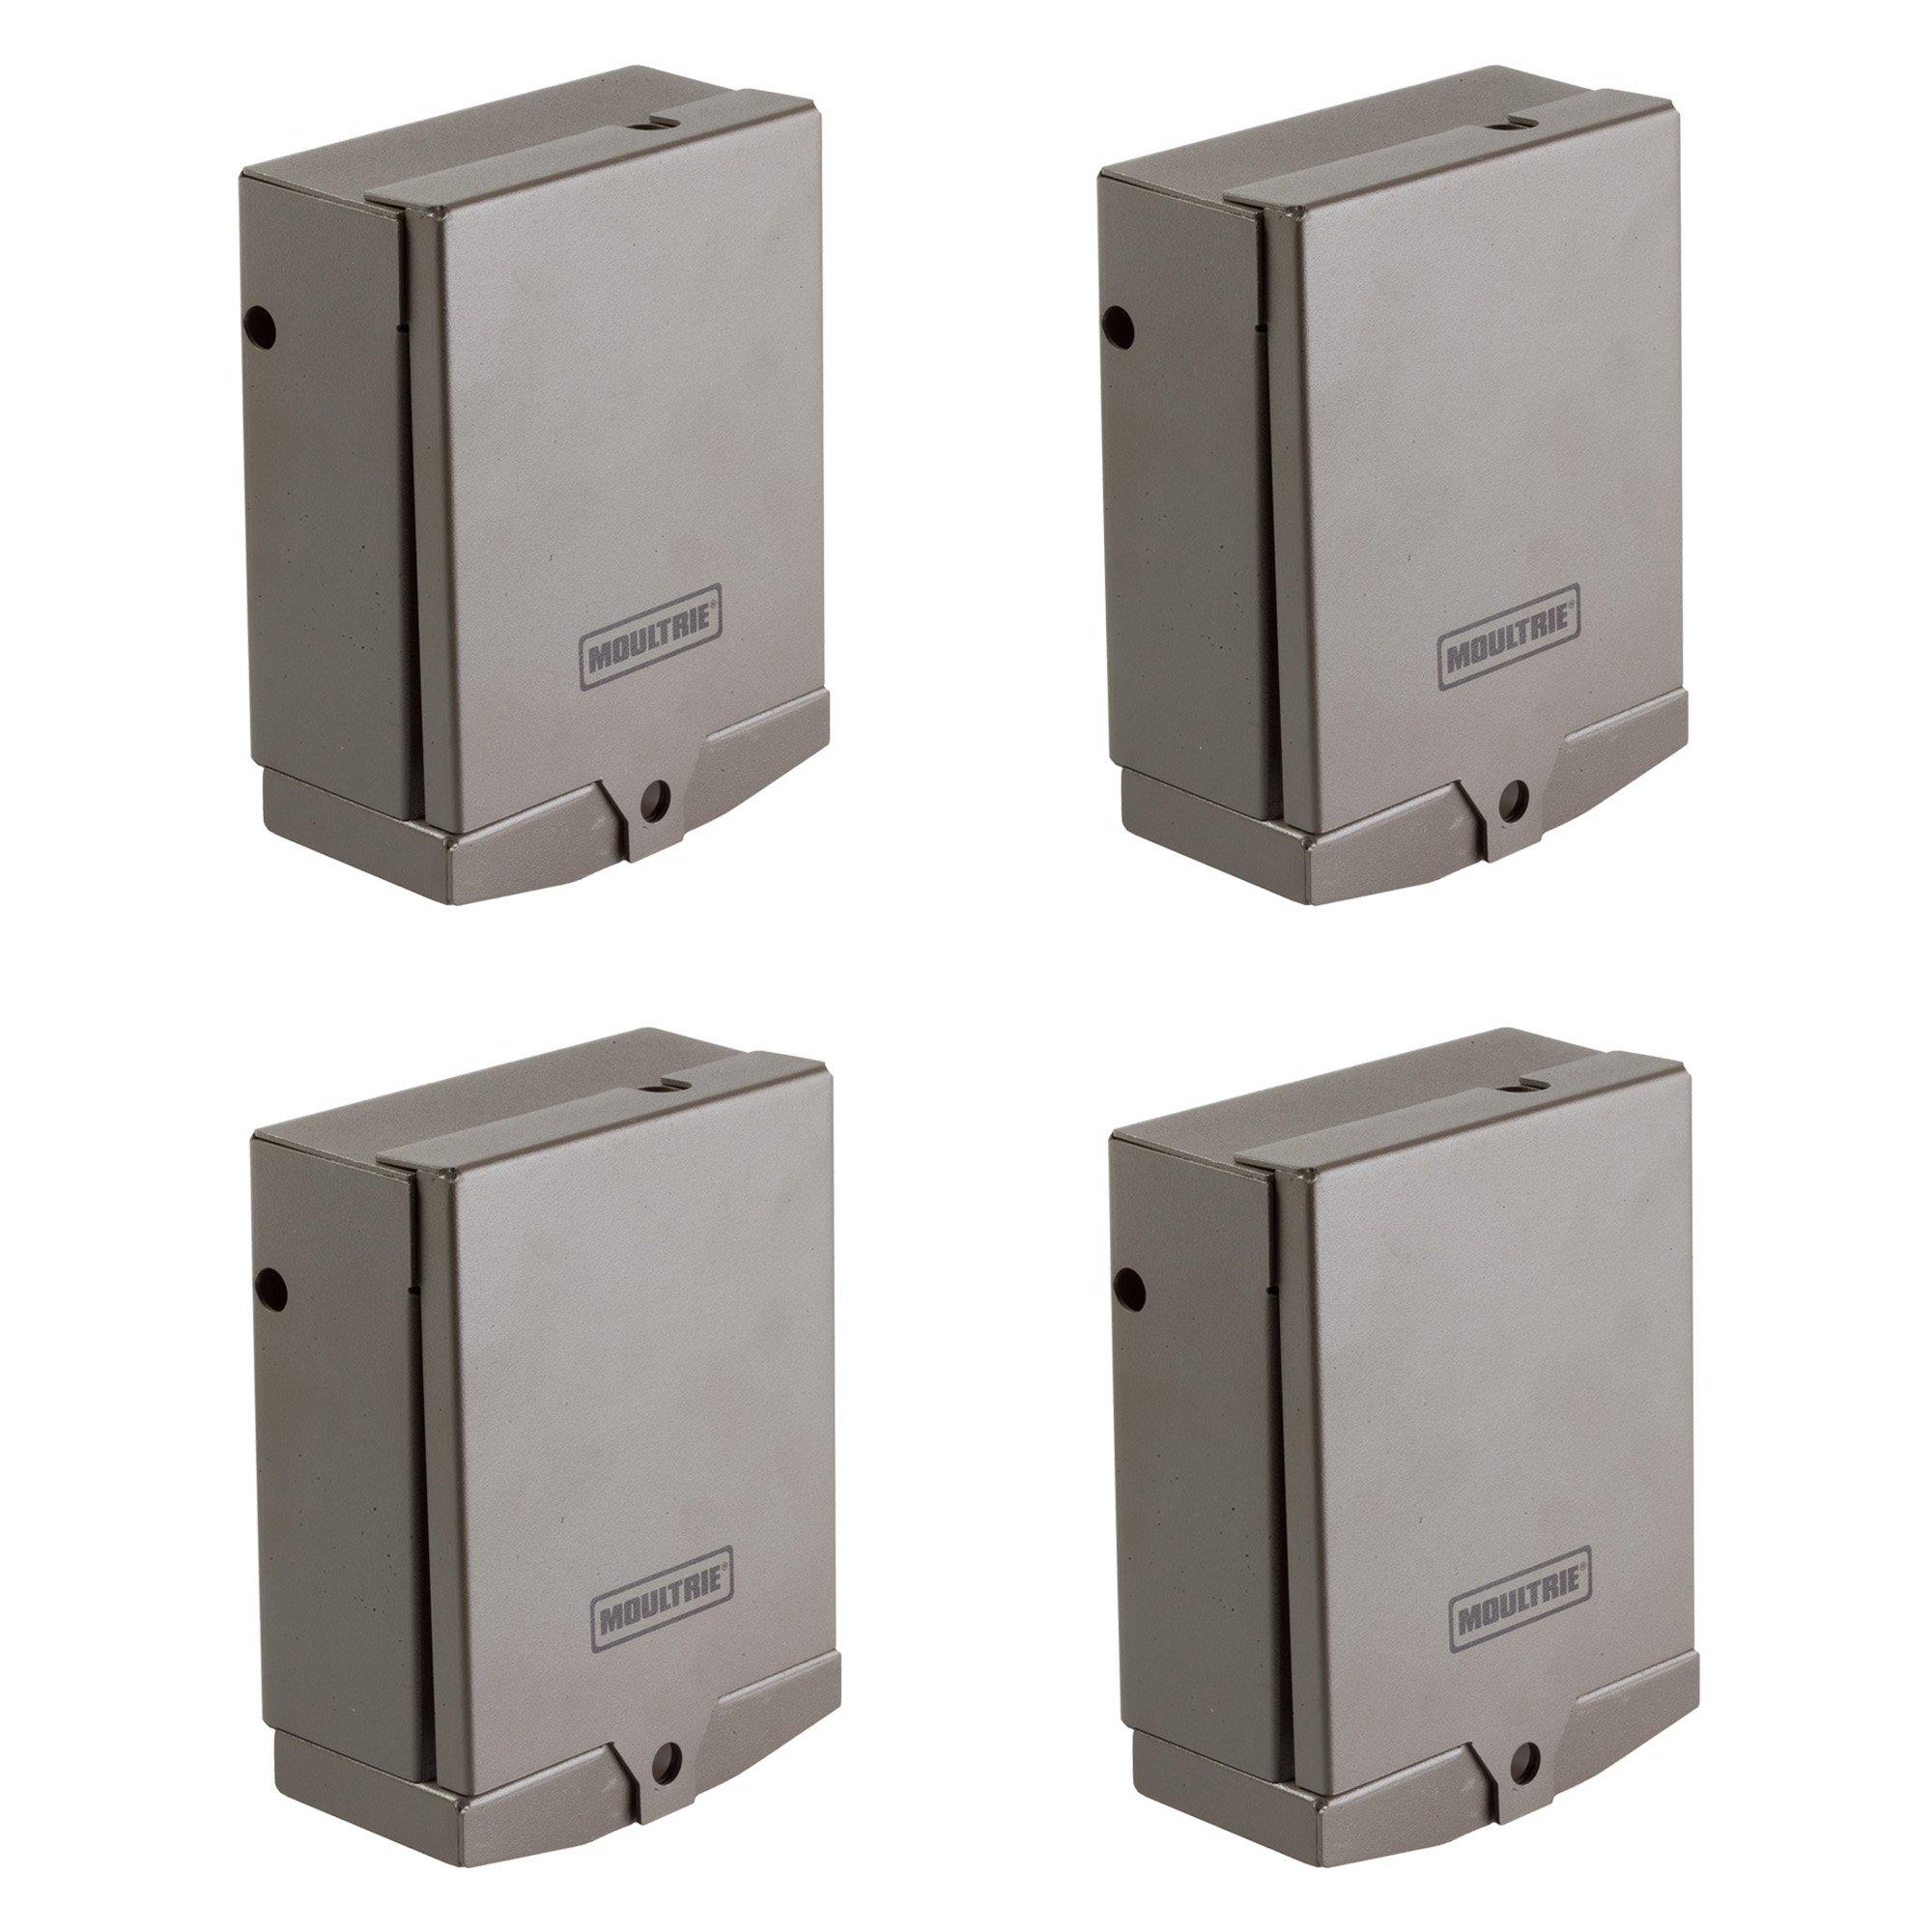 Moultrie Mobile 16-Gauge Steel MV1 Field Modem Security Box, 4 Pack   MCA-13186